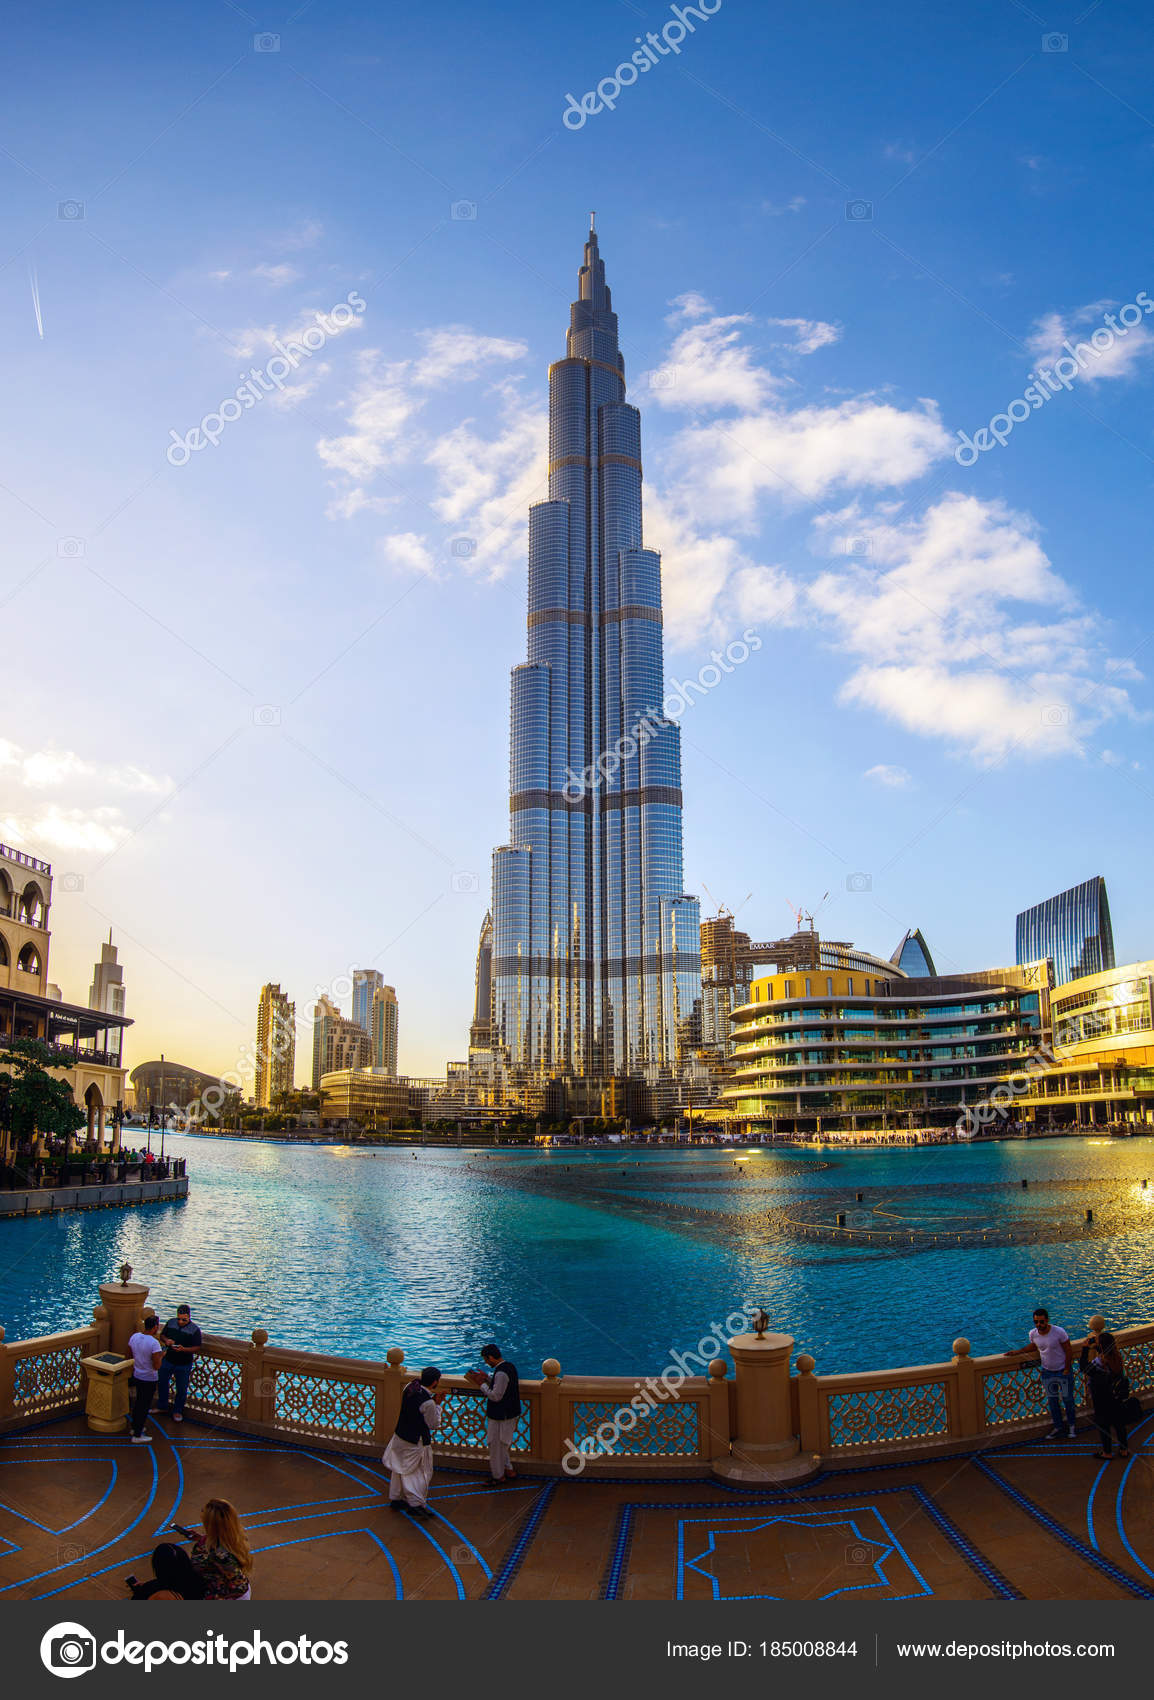 Dubai Emirats Arabes Unis Janvier 2018 Tour Burj Khalifa